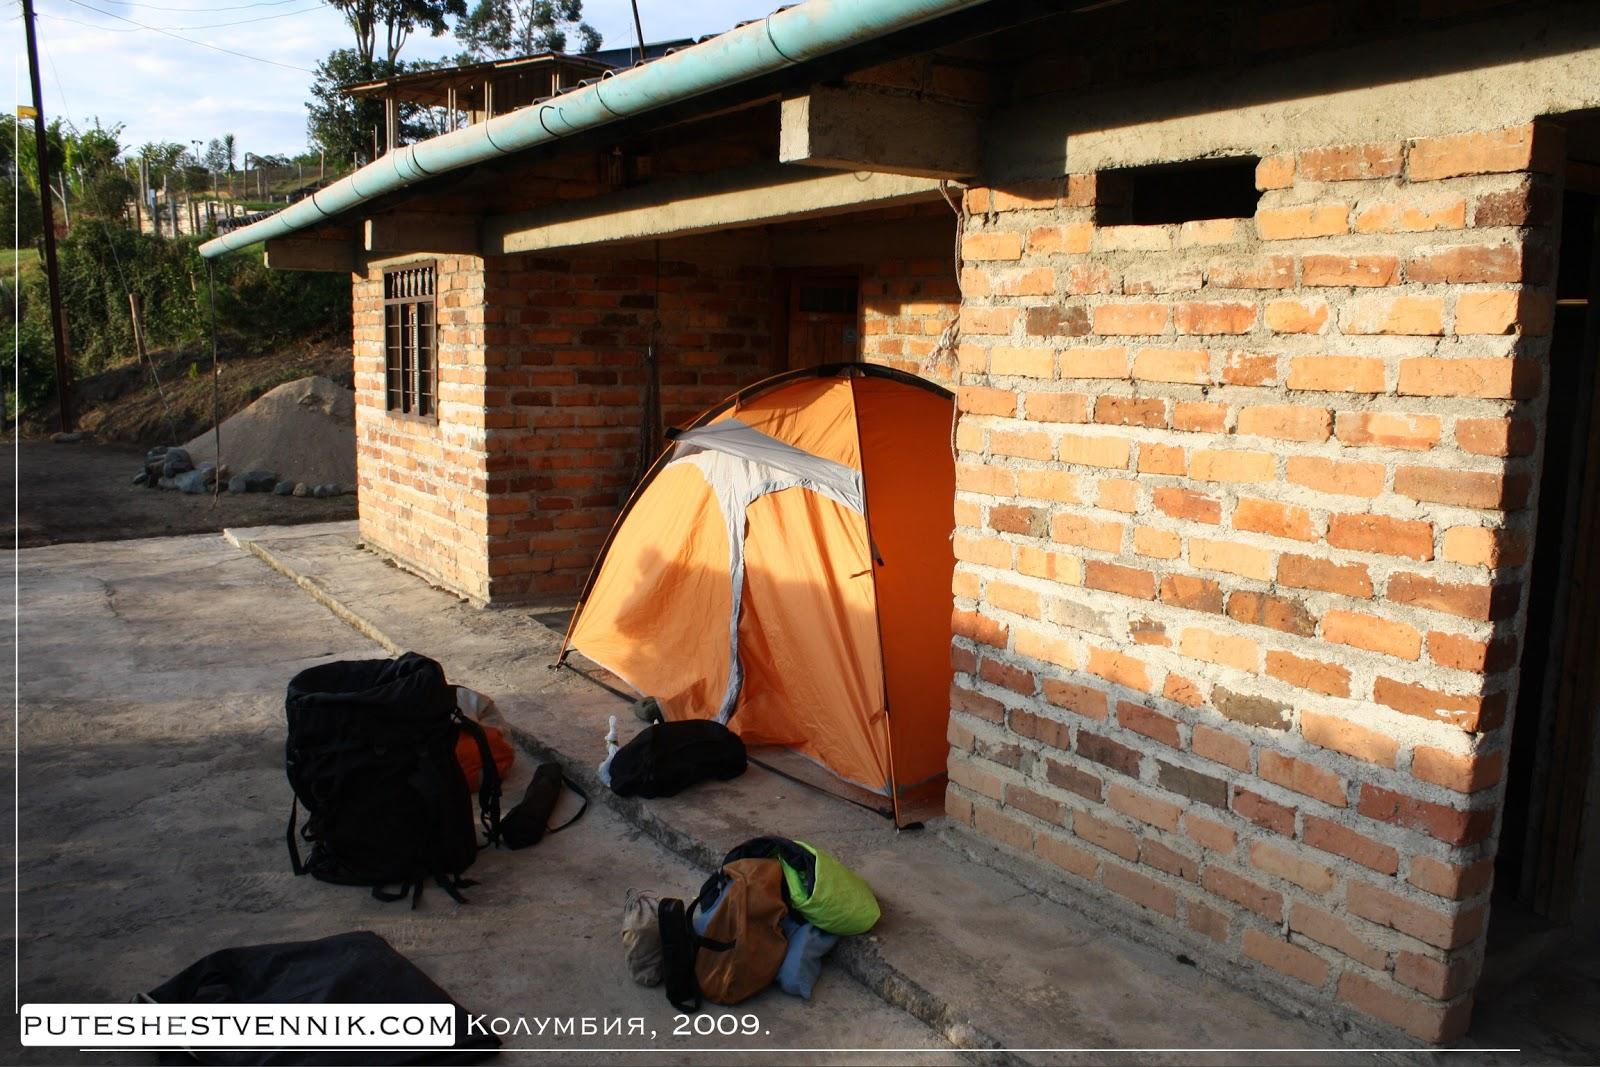 Палатка во дворе дома колумбийцев